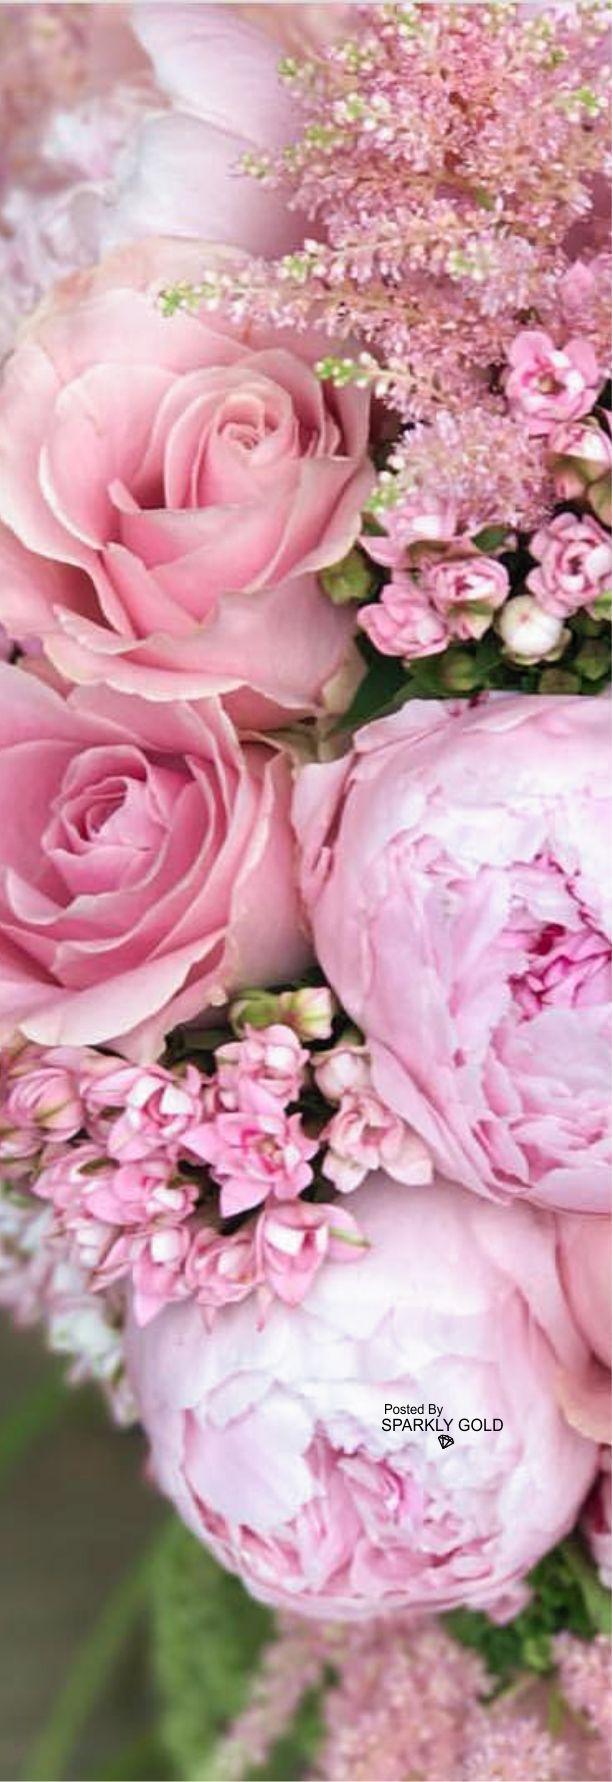 Pink Fondos Para Iphone Pinterest Flowers Flower And Gardens